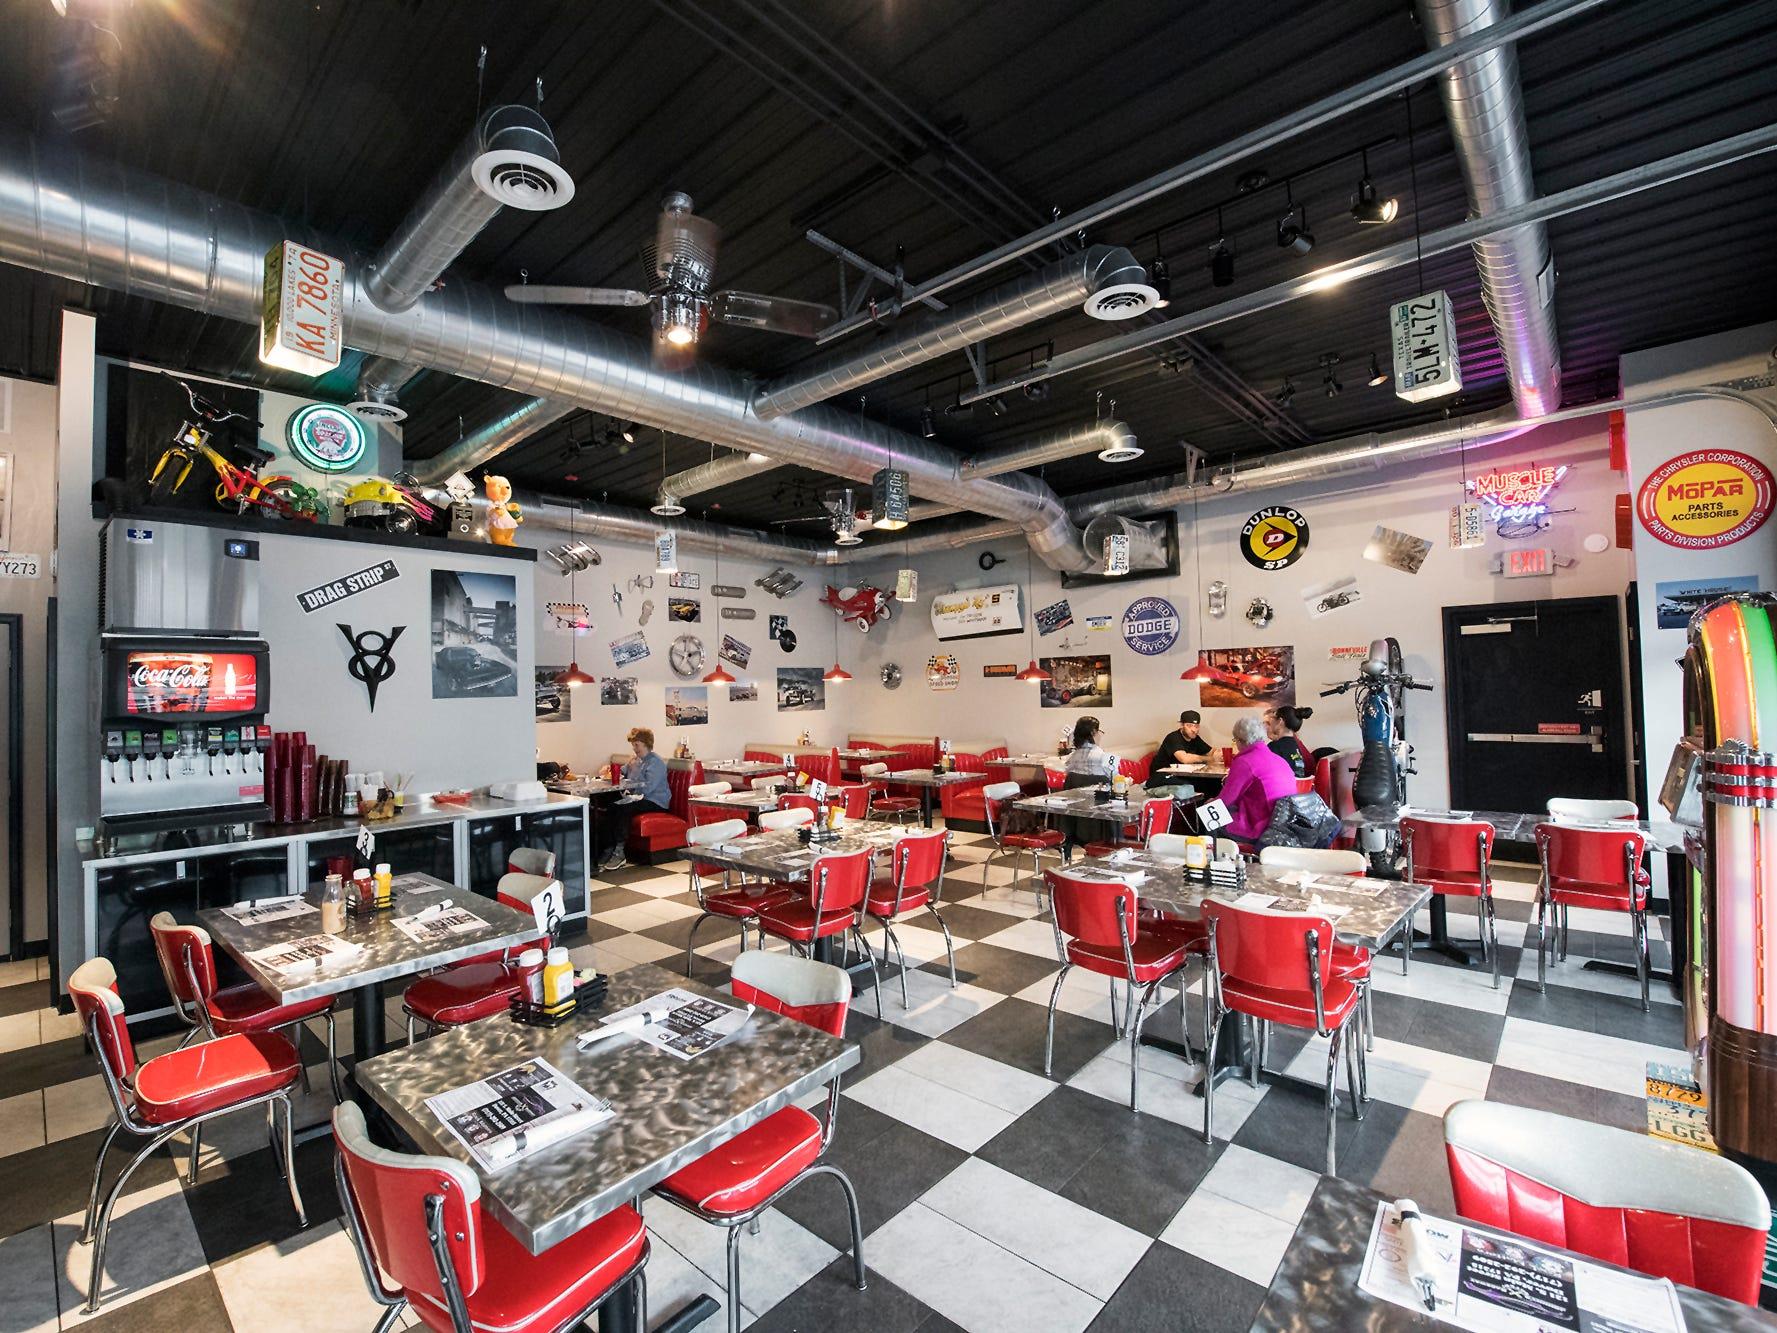 The interior of Johnny's Raceway Eatery Tuesday January 8, 2019.